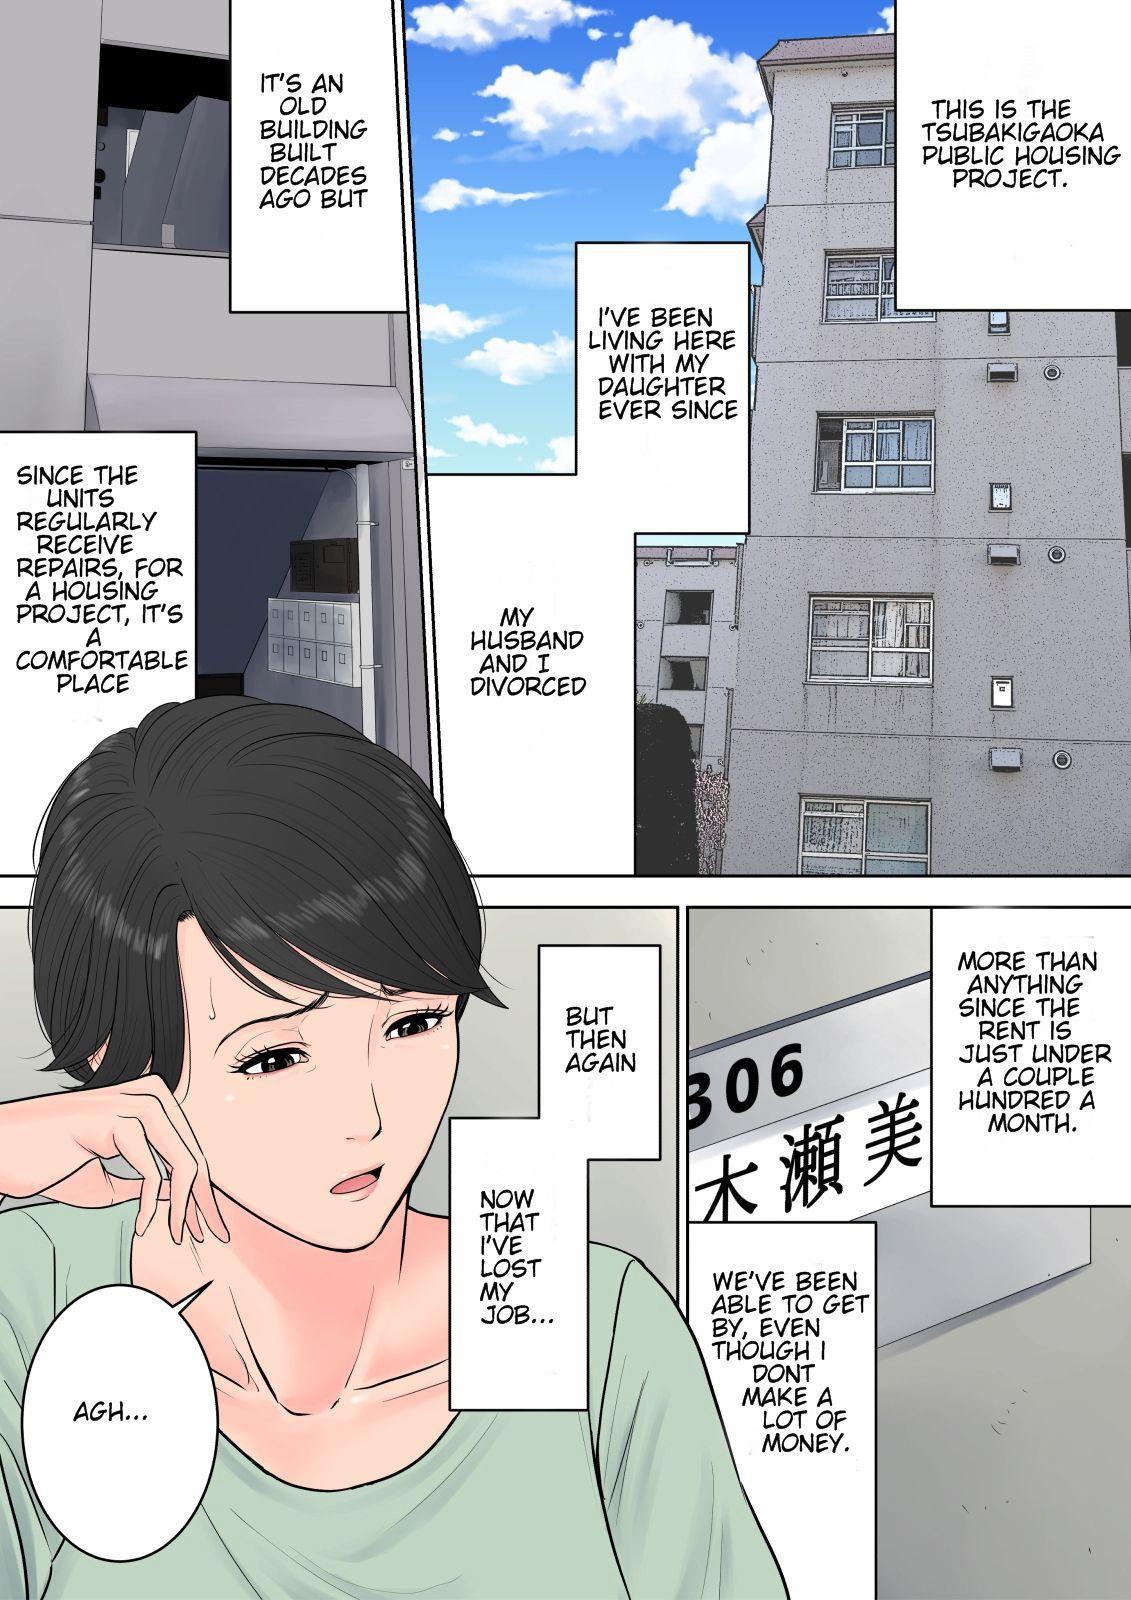 Tsubakigaoka Danchi no Kanrinin | Tsubakigaoka Housing Project Manager 2